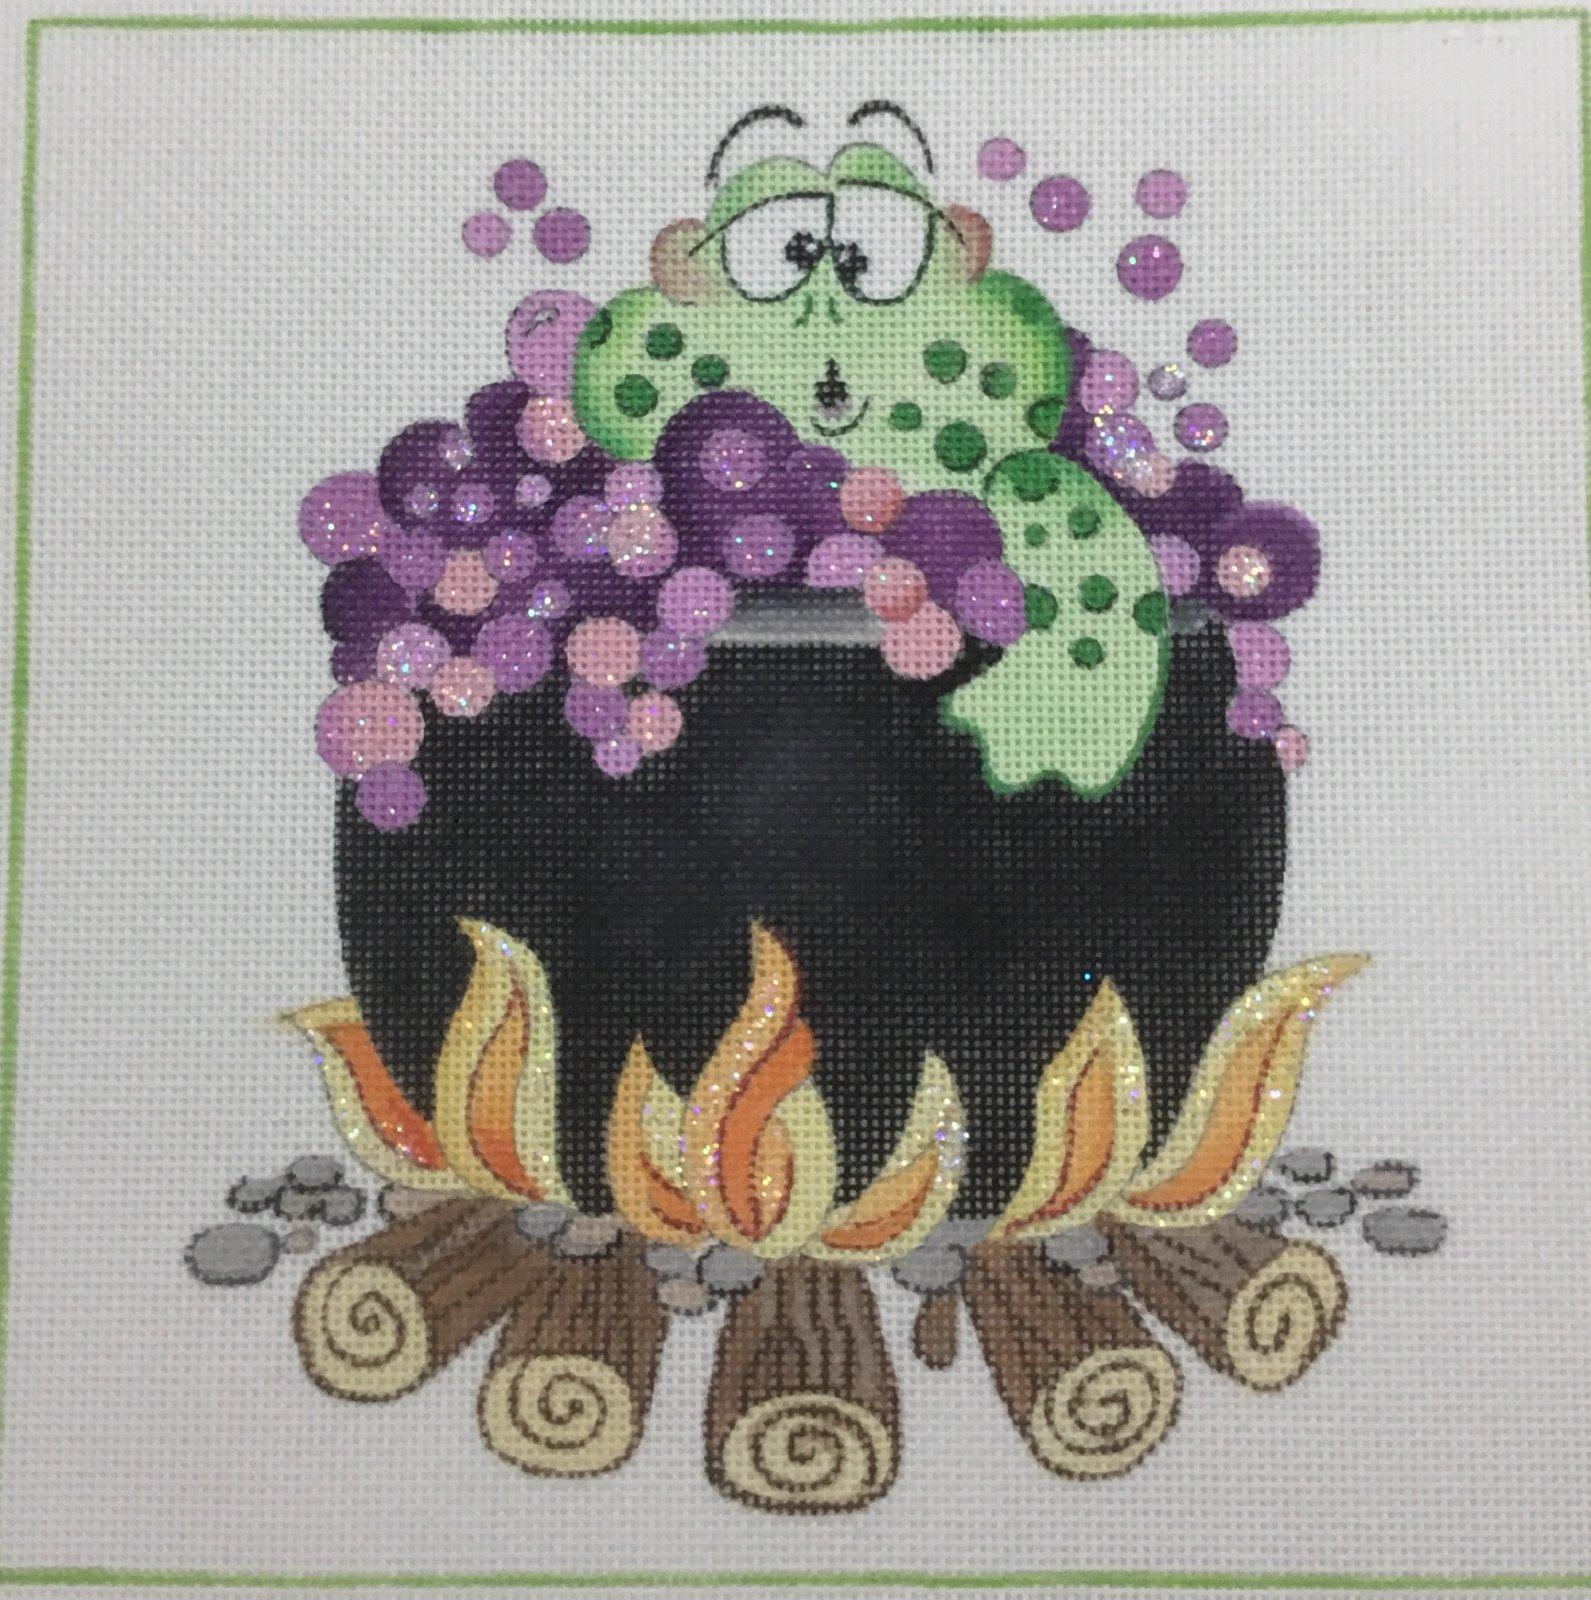 Frog in Cauldron, 18 ct., 8 x 8